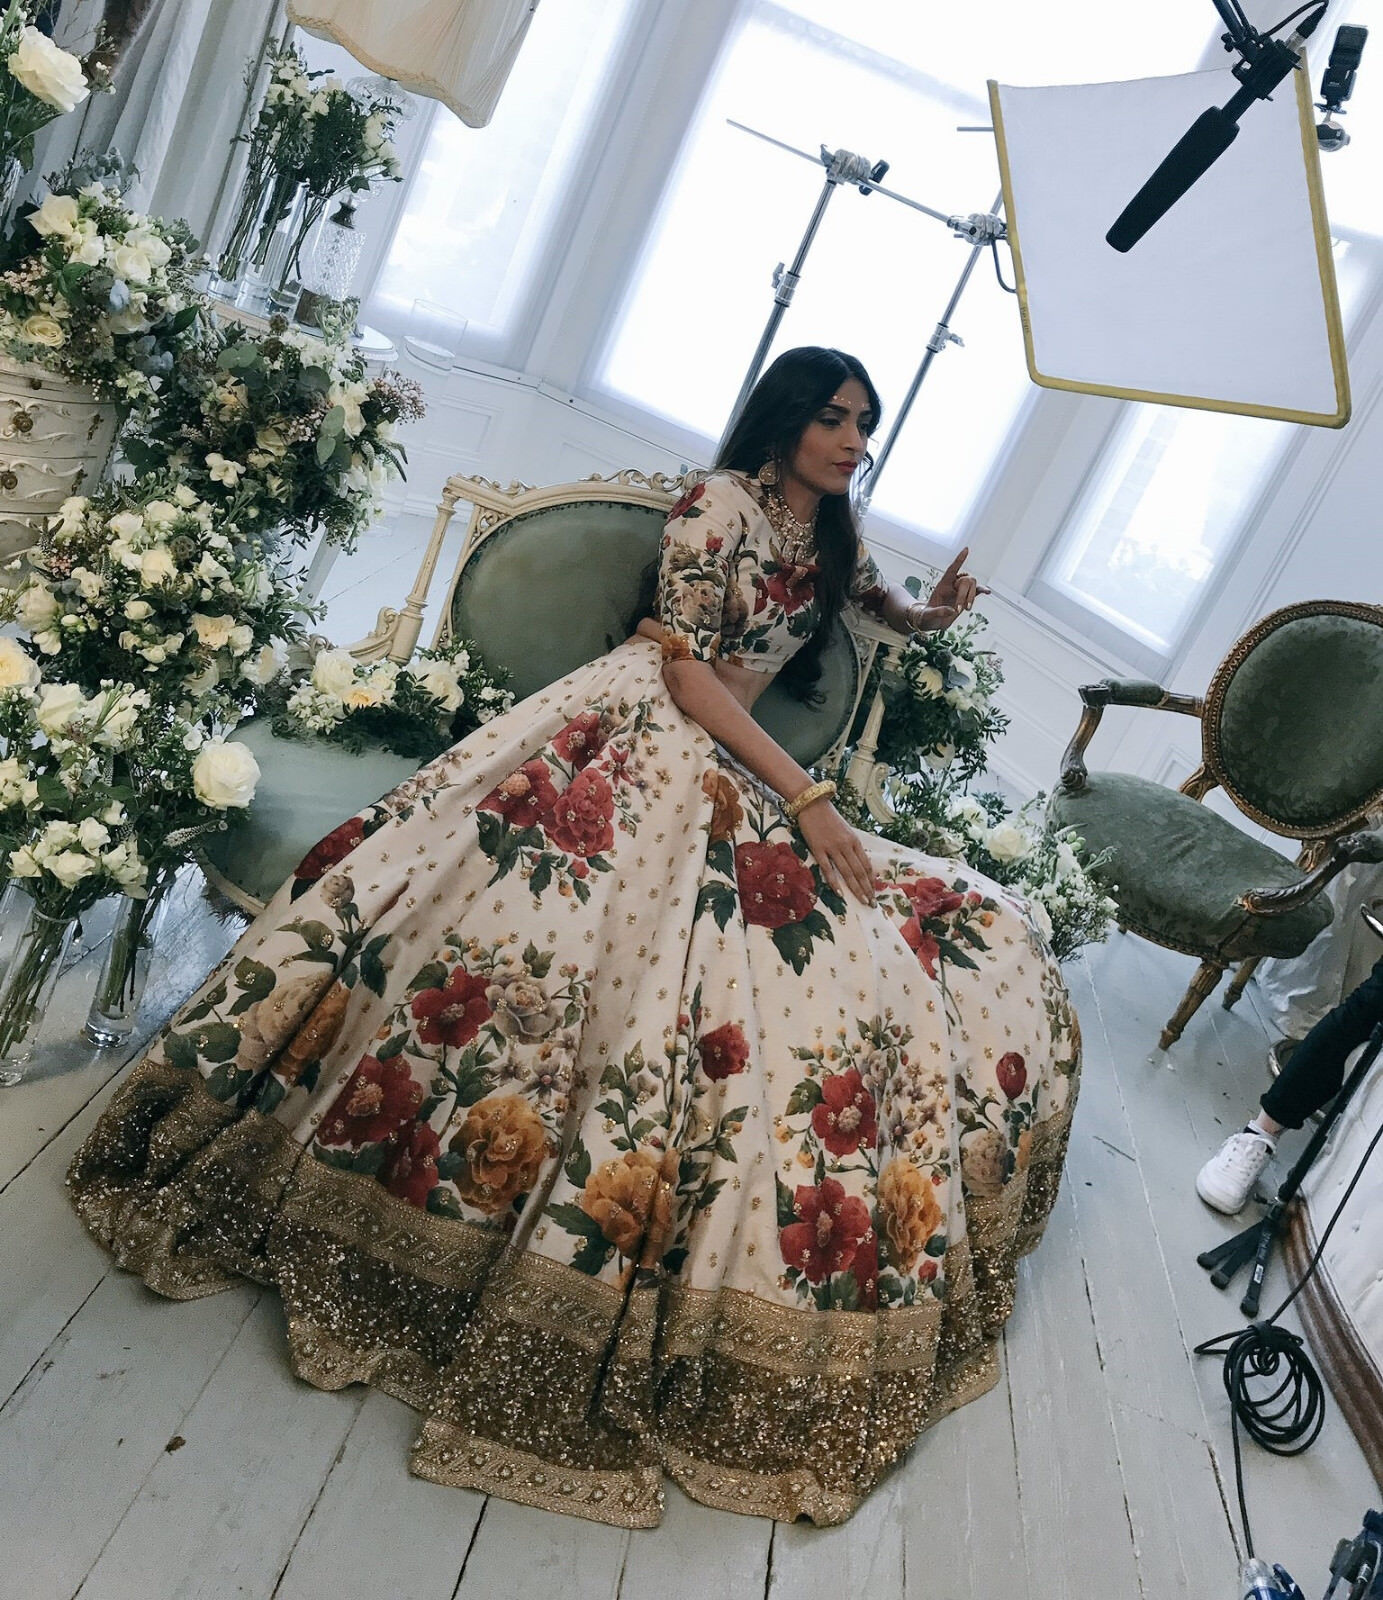 Indian Clothes For Wedding Sonam Kapoor Cream Floral Lehenga Choli Party Dress